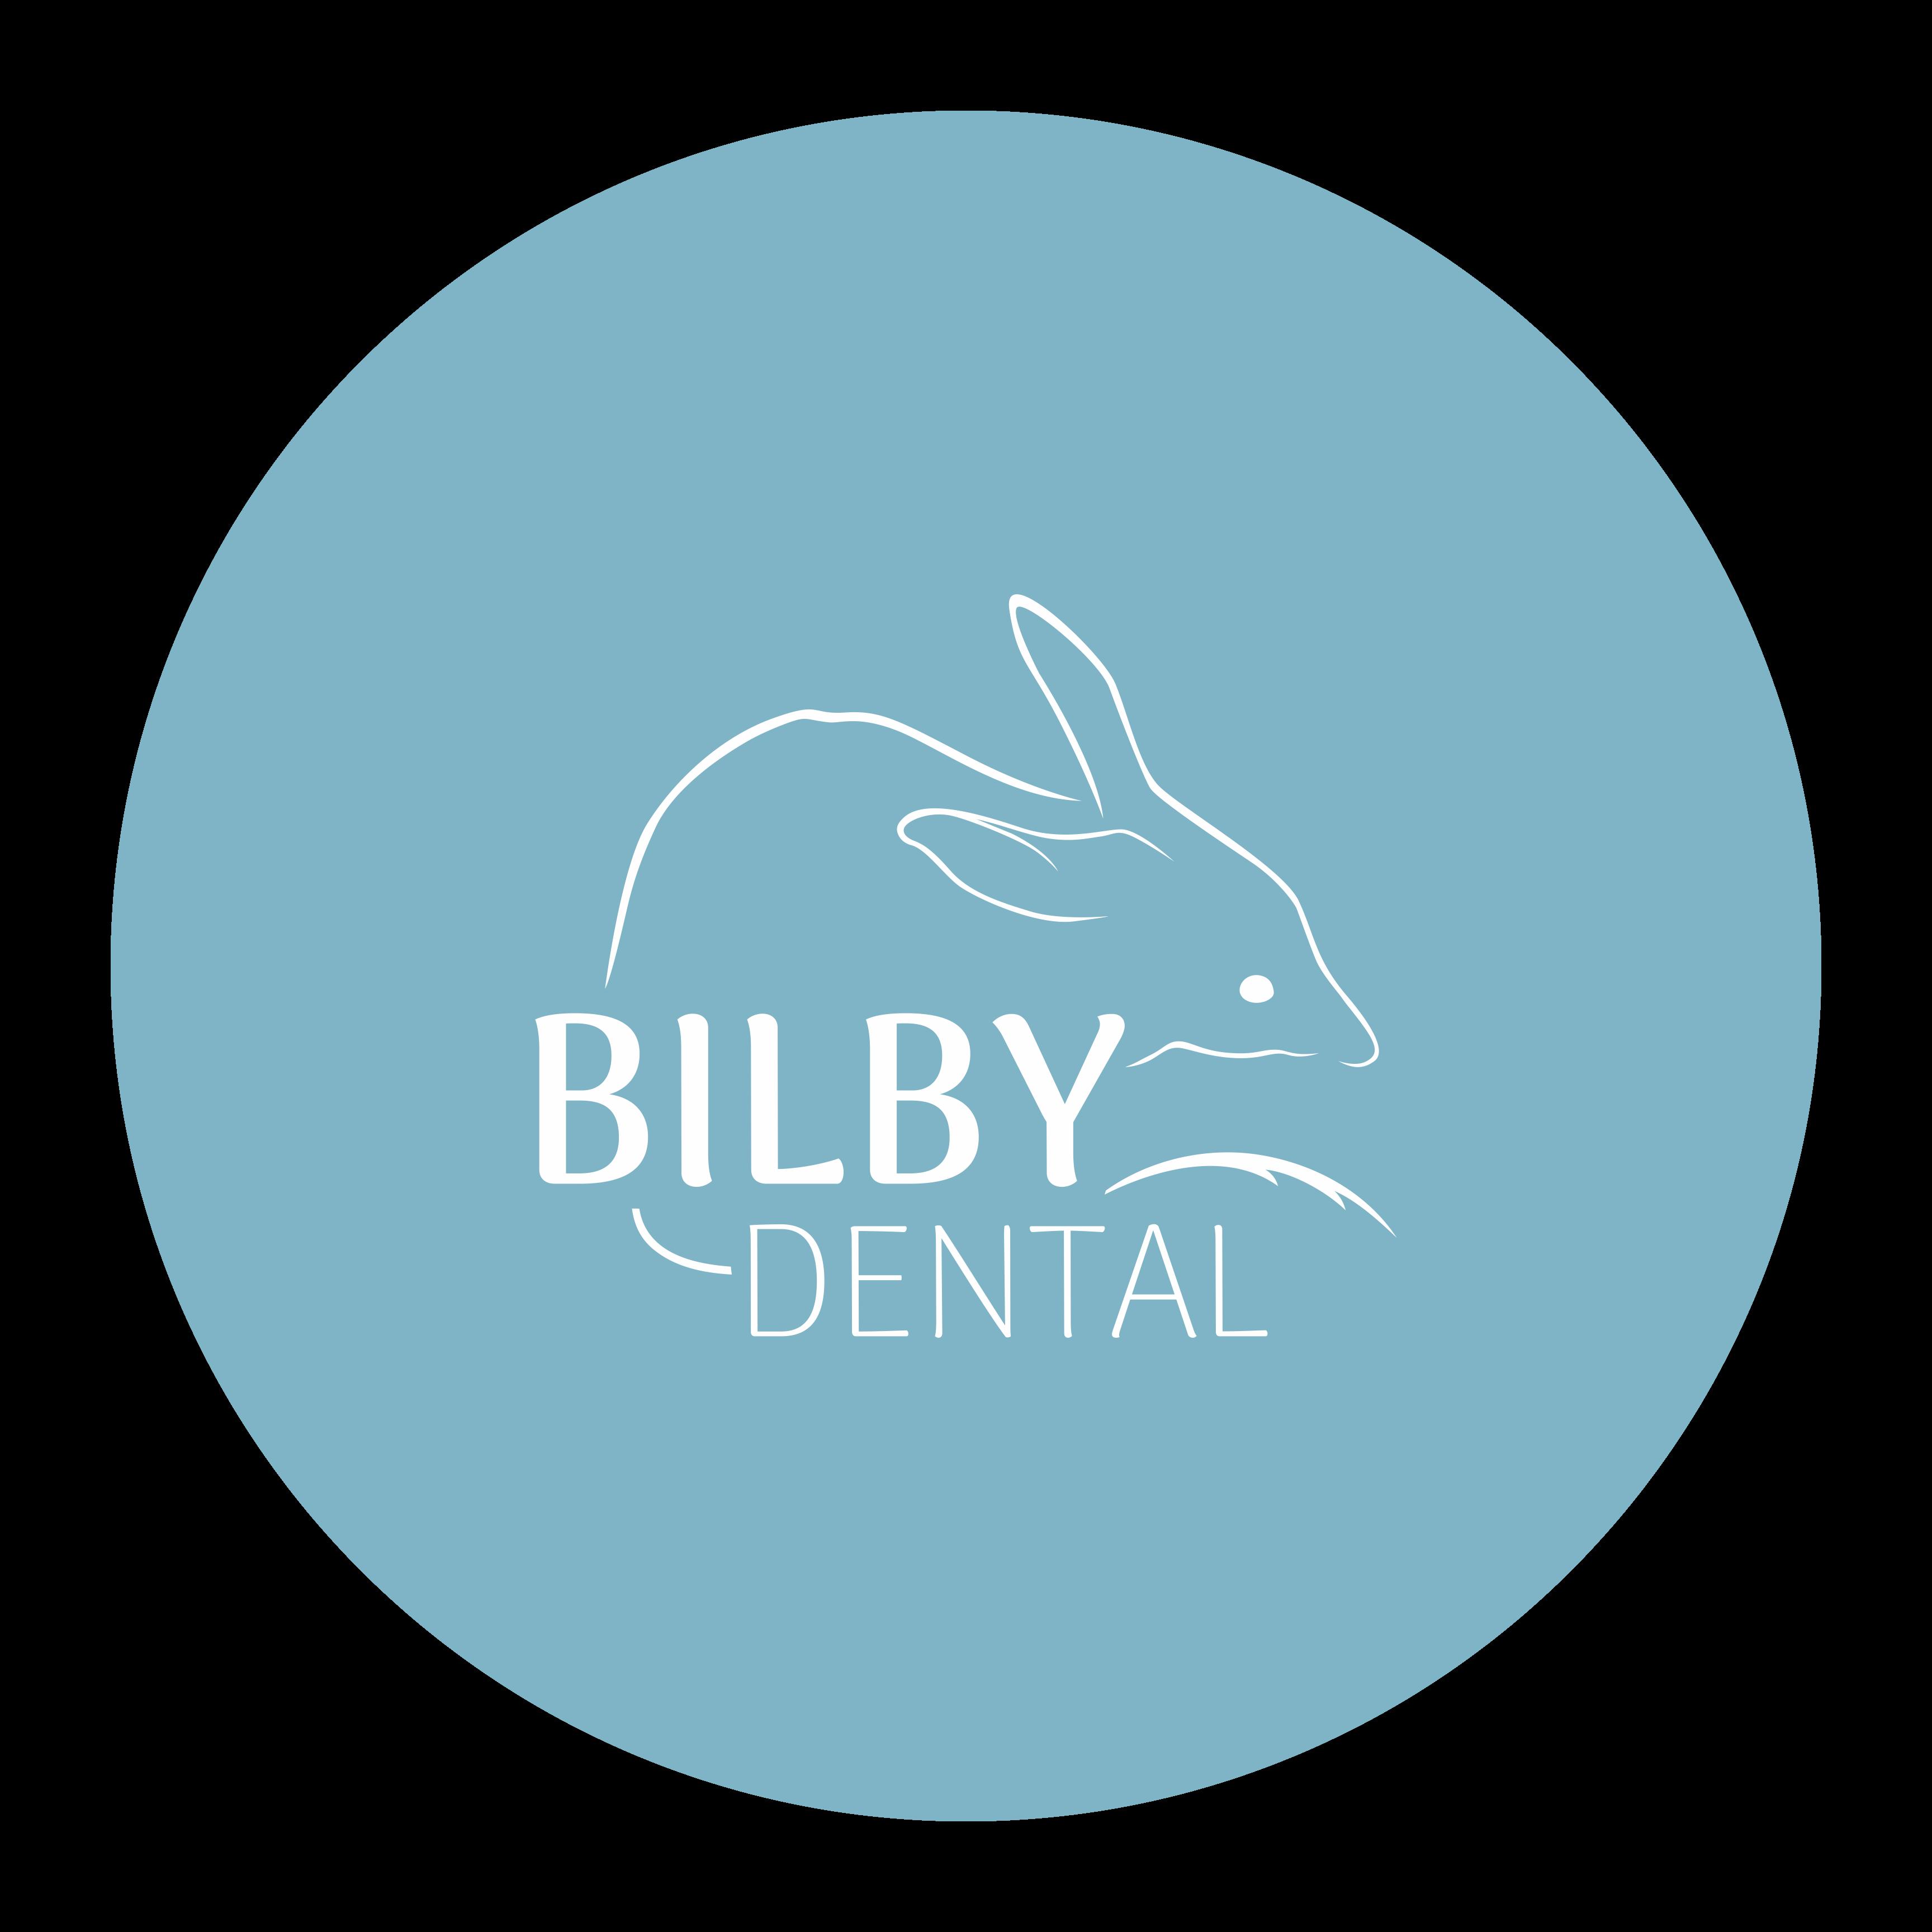 logo for Bilby Dental Dentists